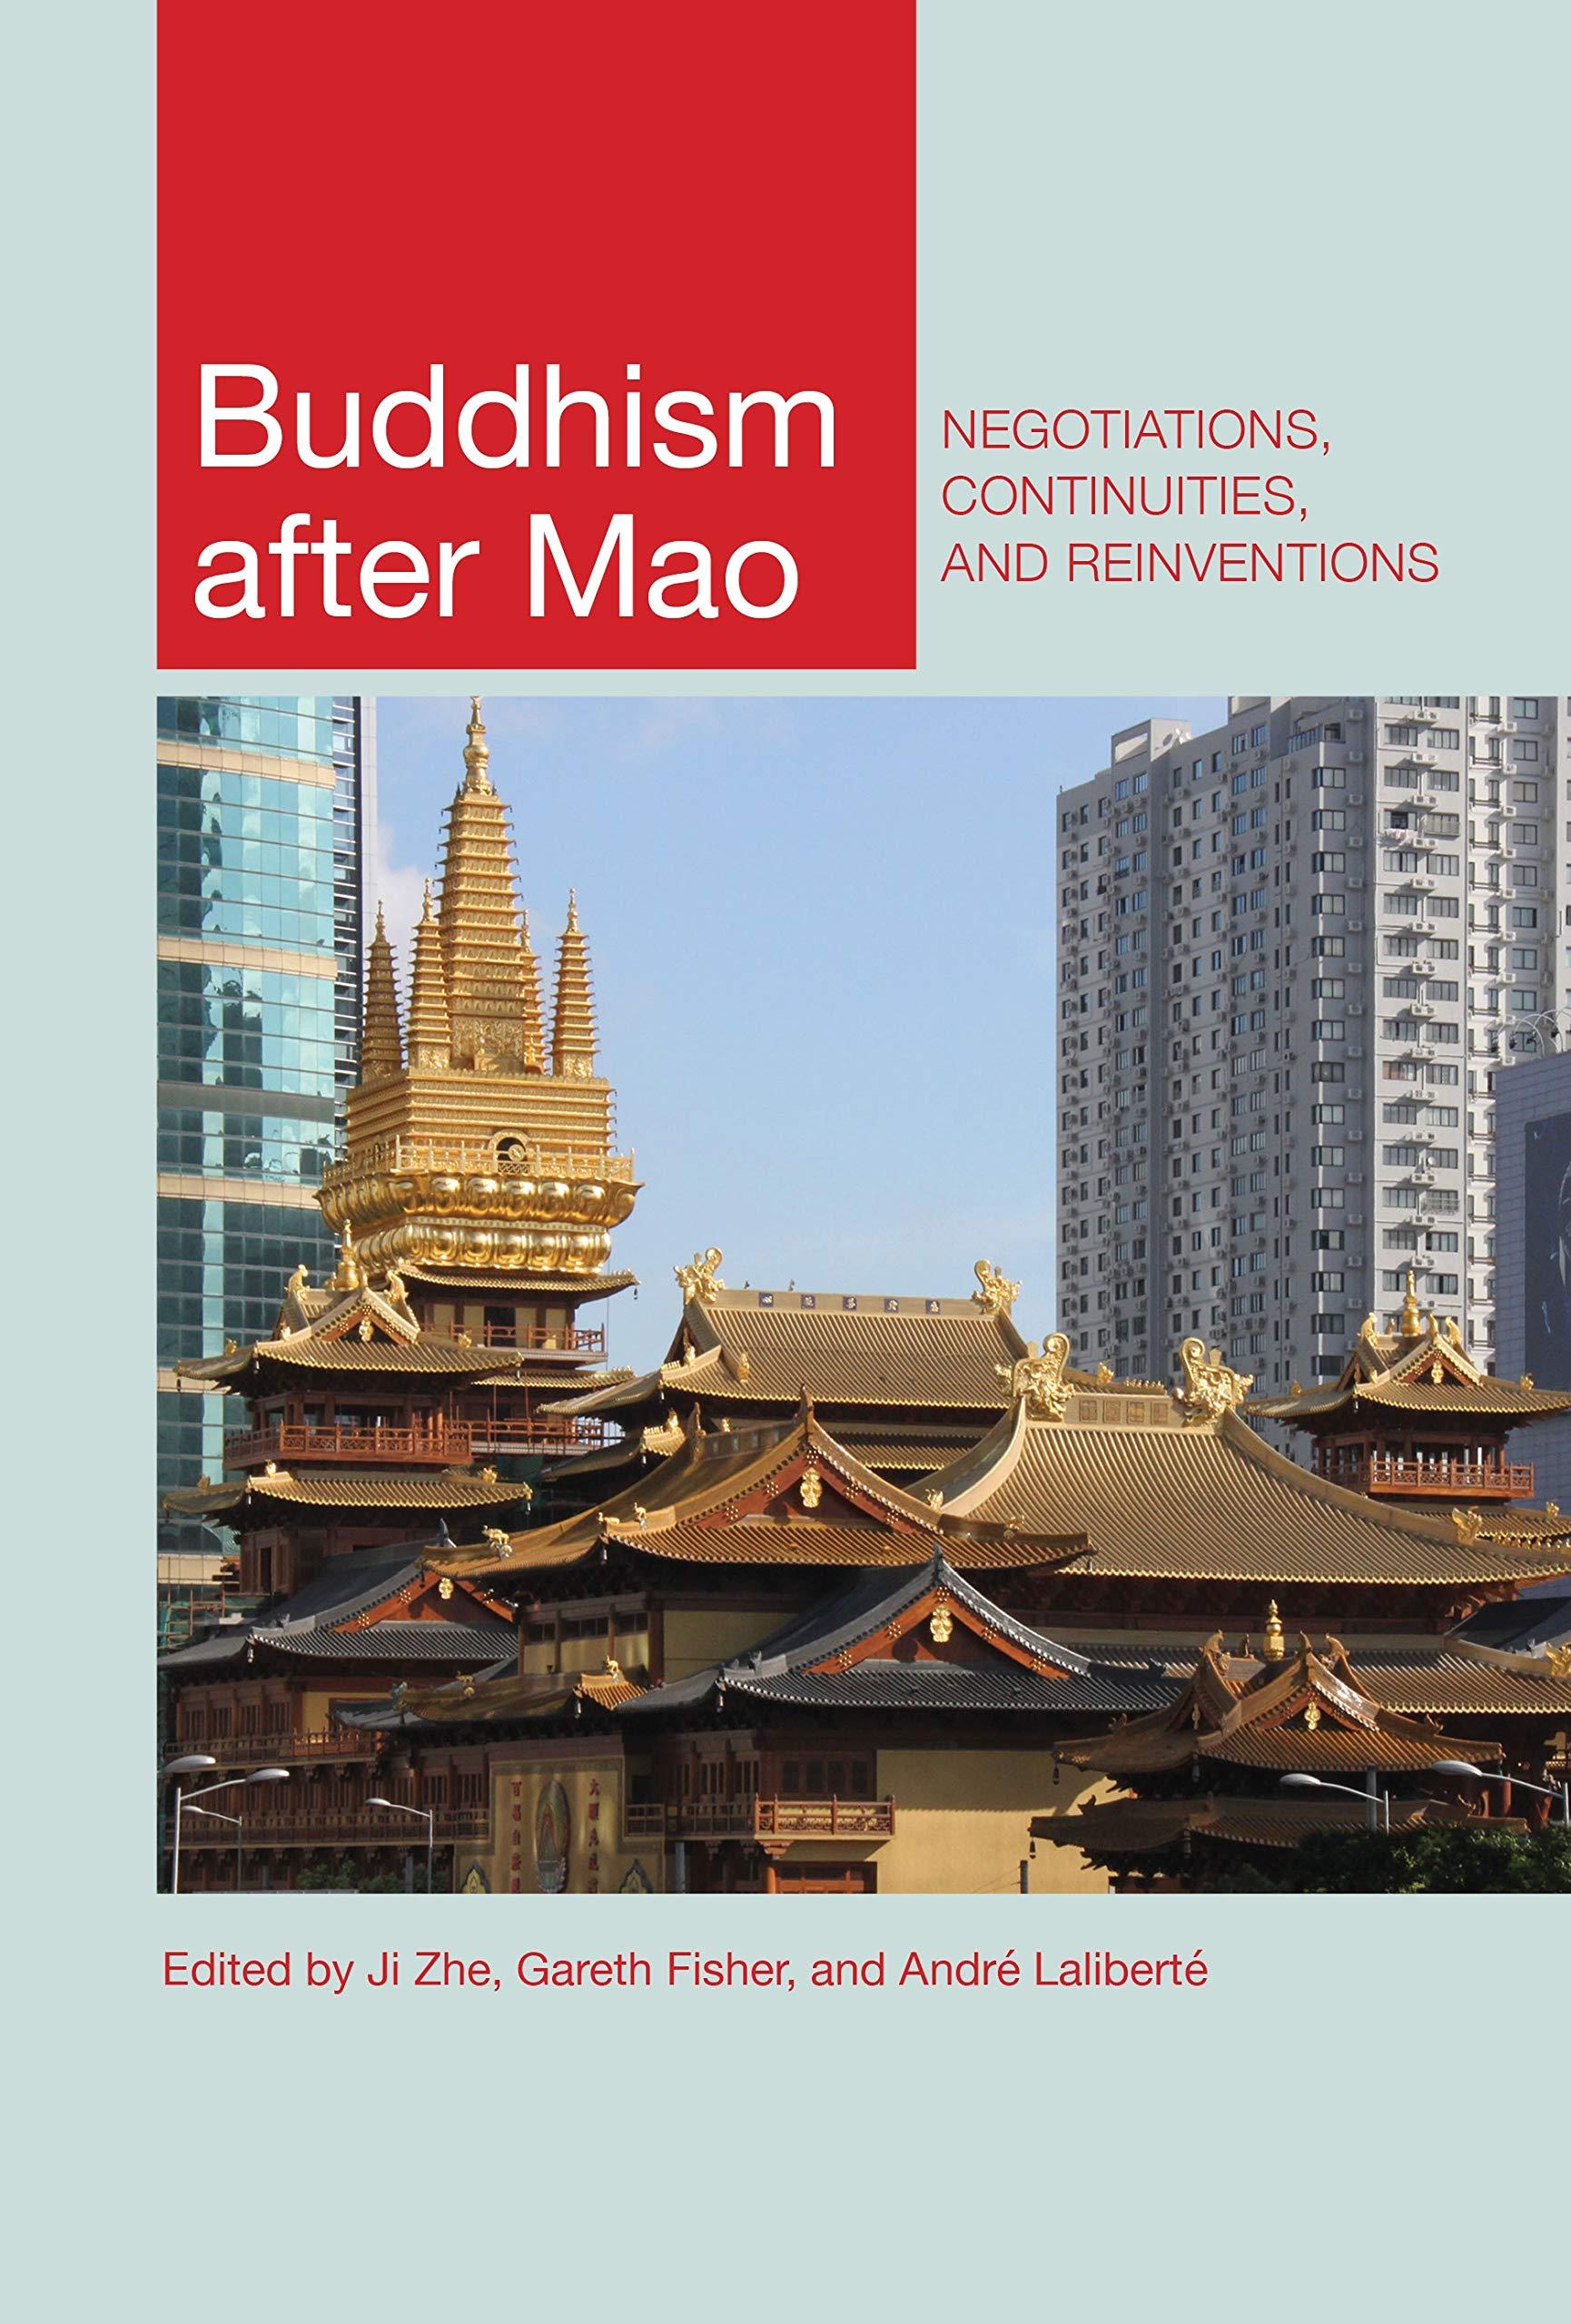 Buddhism_after_Mao